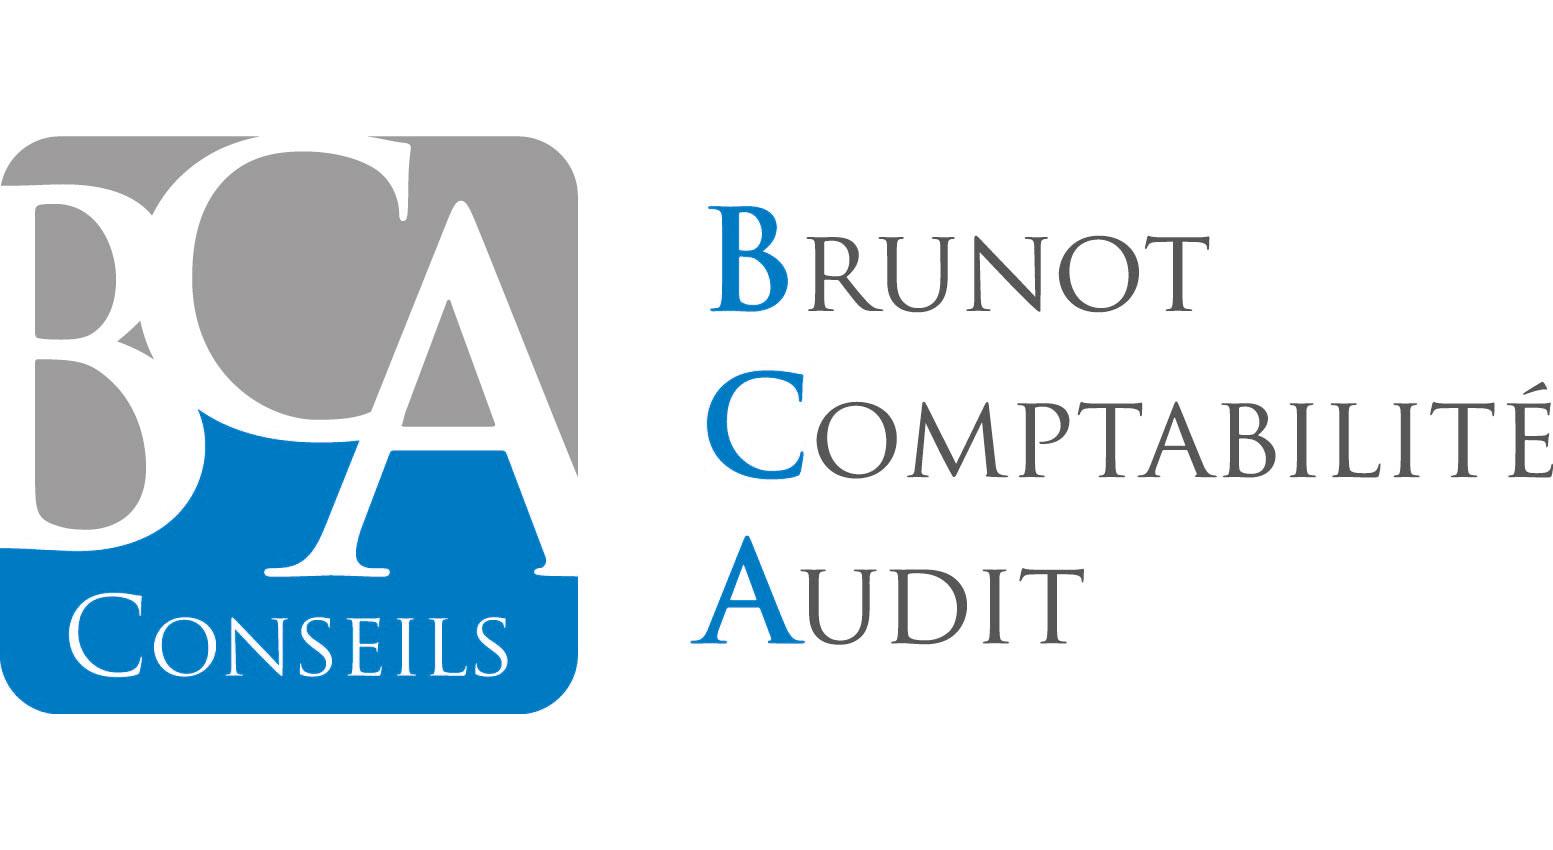 BCA Conseils